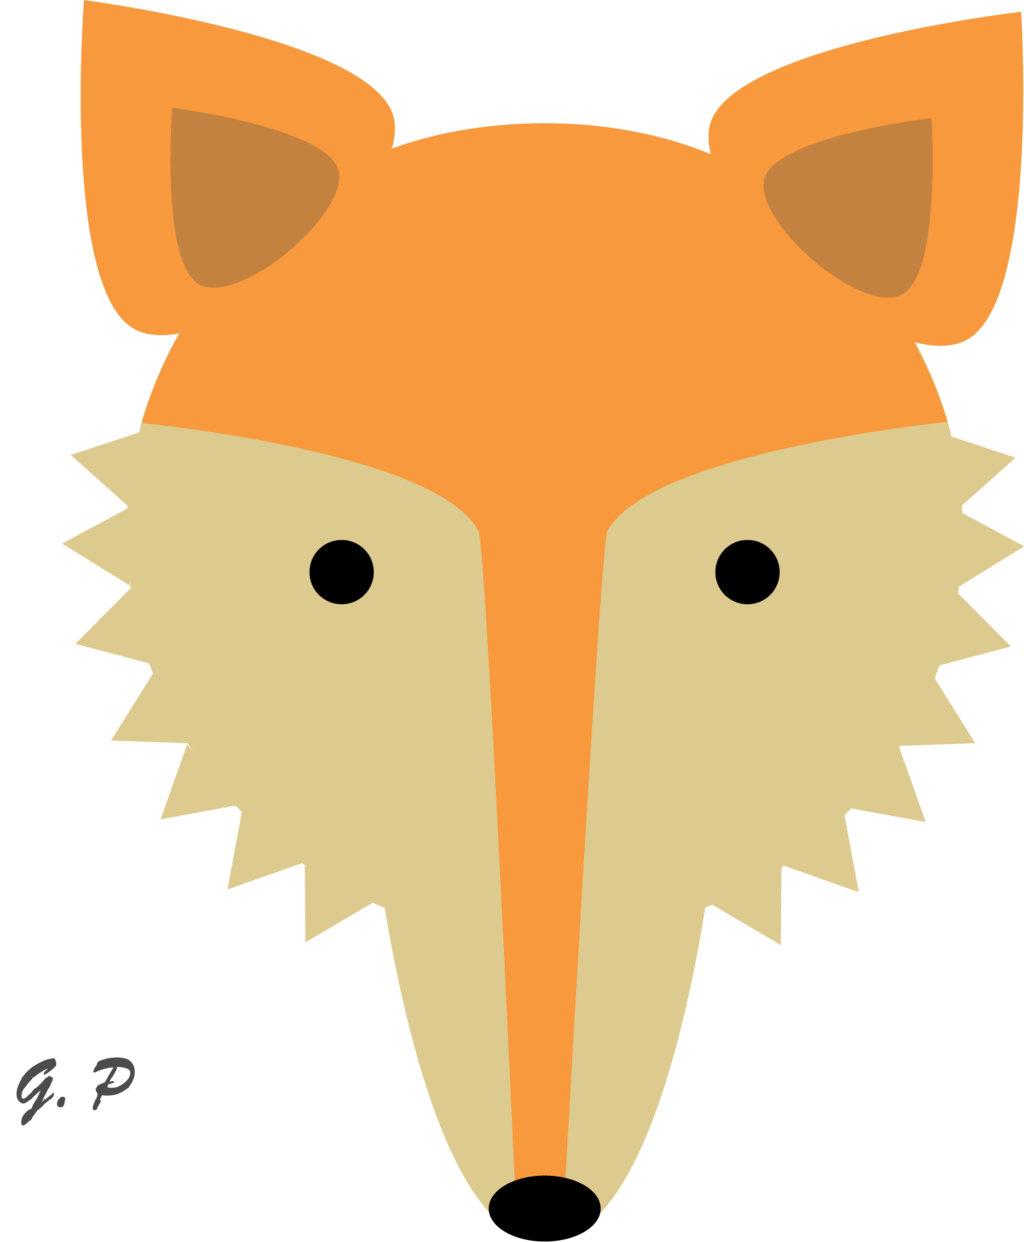 Fox Png 2